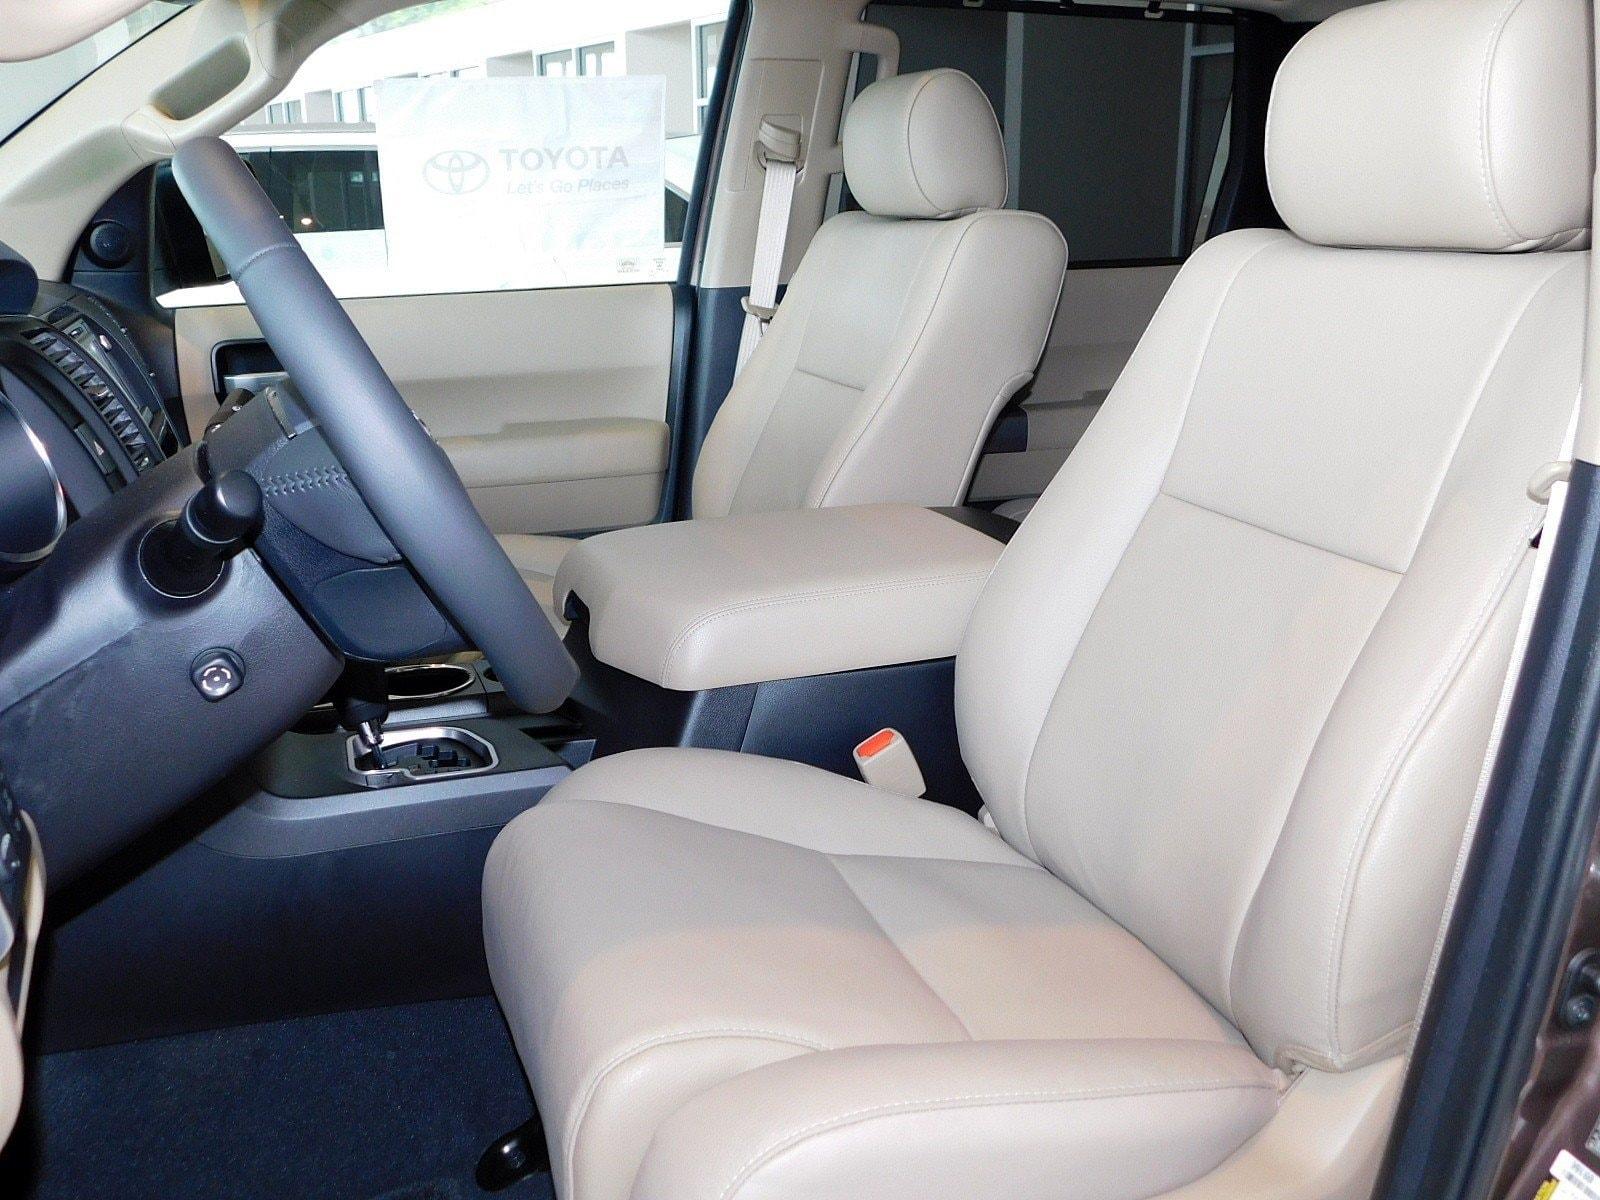 New 2019 Toyota Sequoia For Sale at Ciocca Toyota of Williamsport